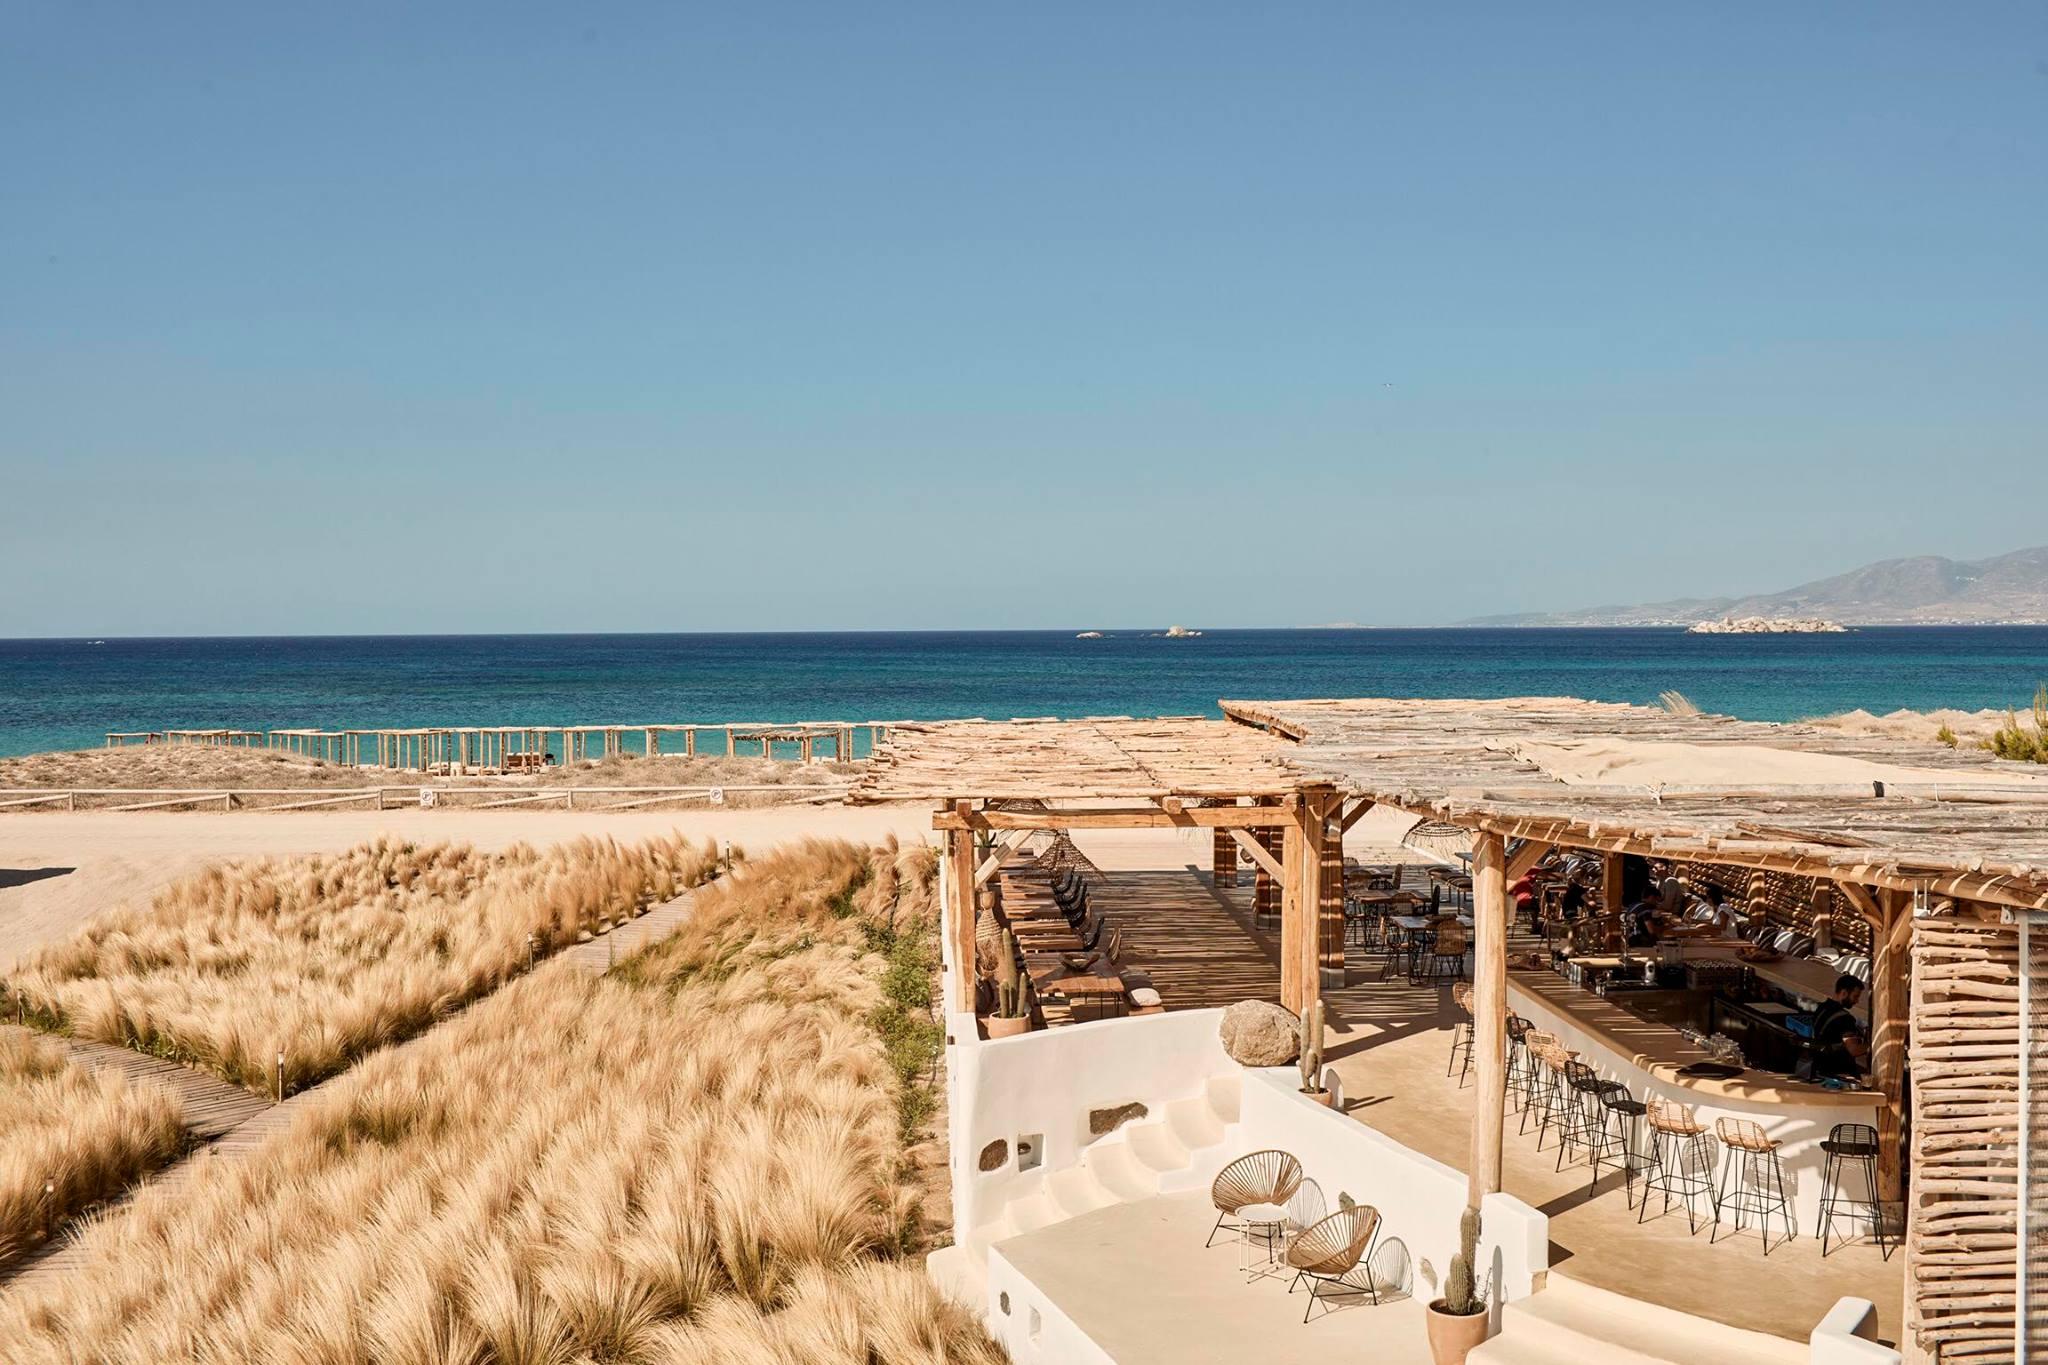 Tortuga Naxos - bar restaurant Plaka beach club